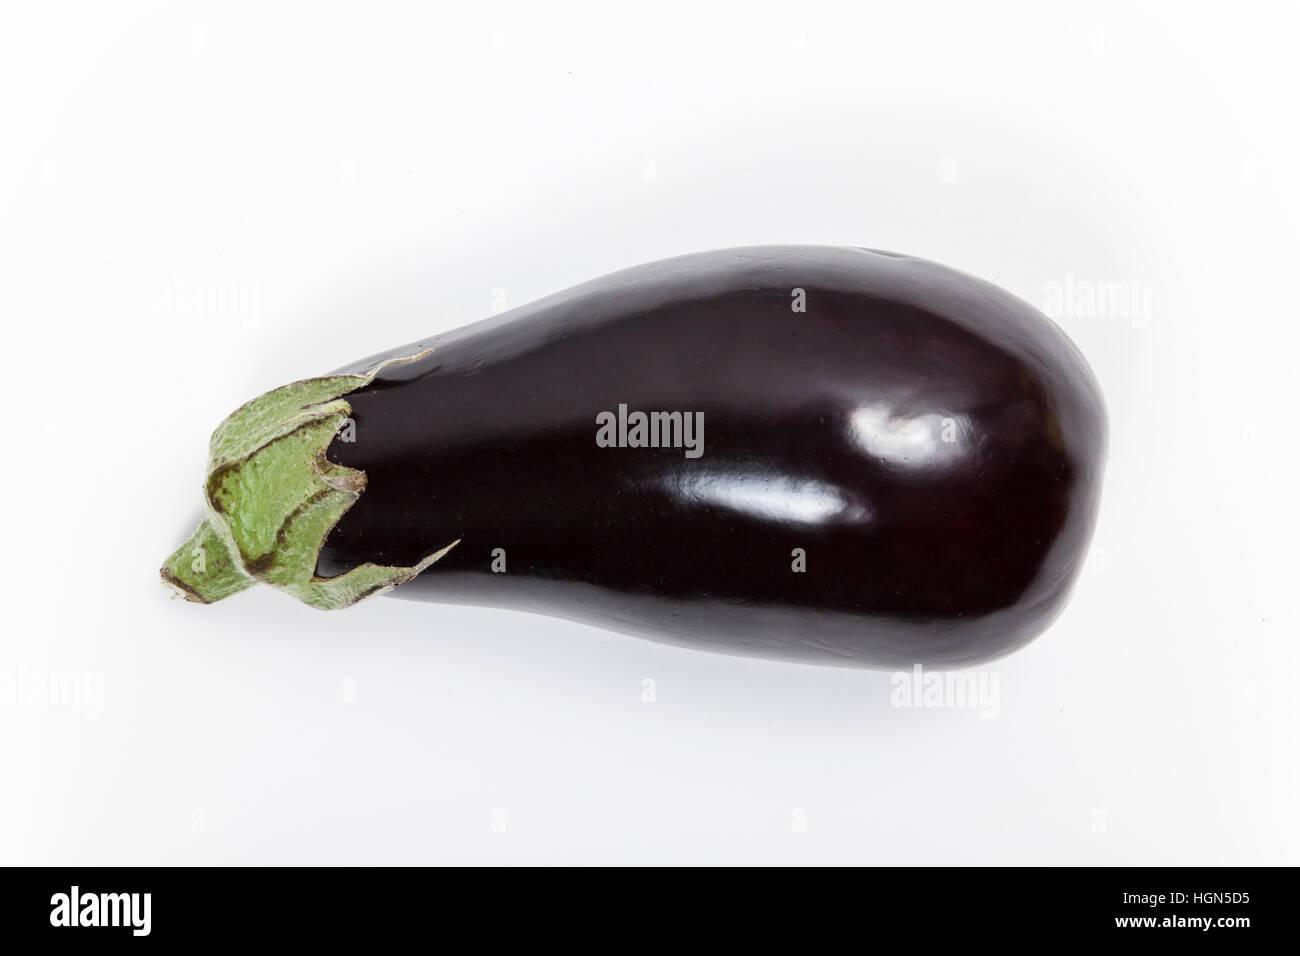 Aubergine isolated - Stock Image